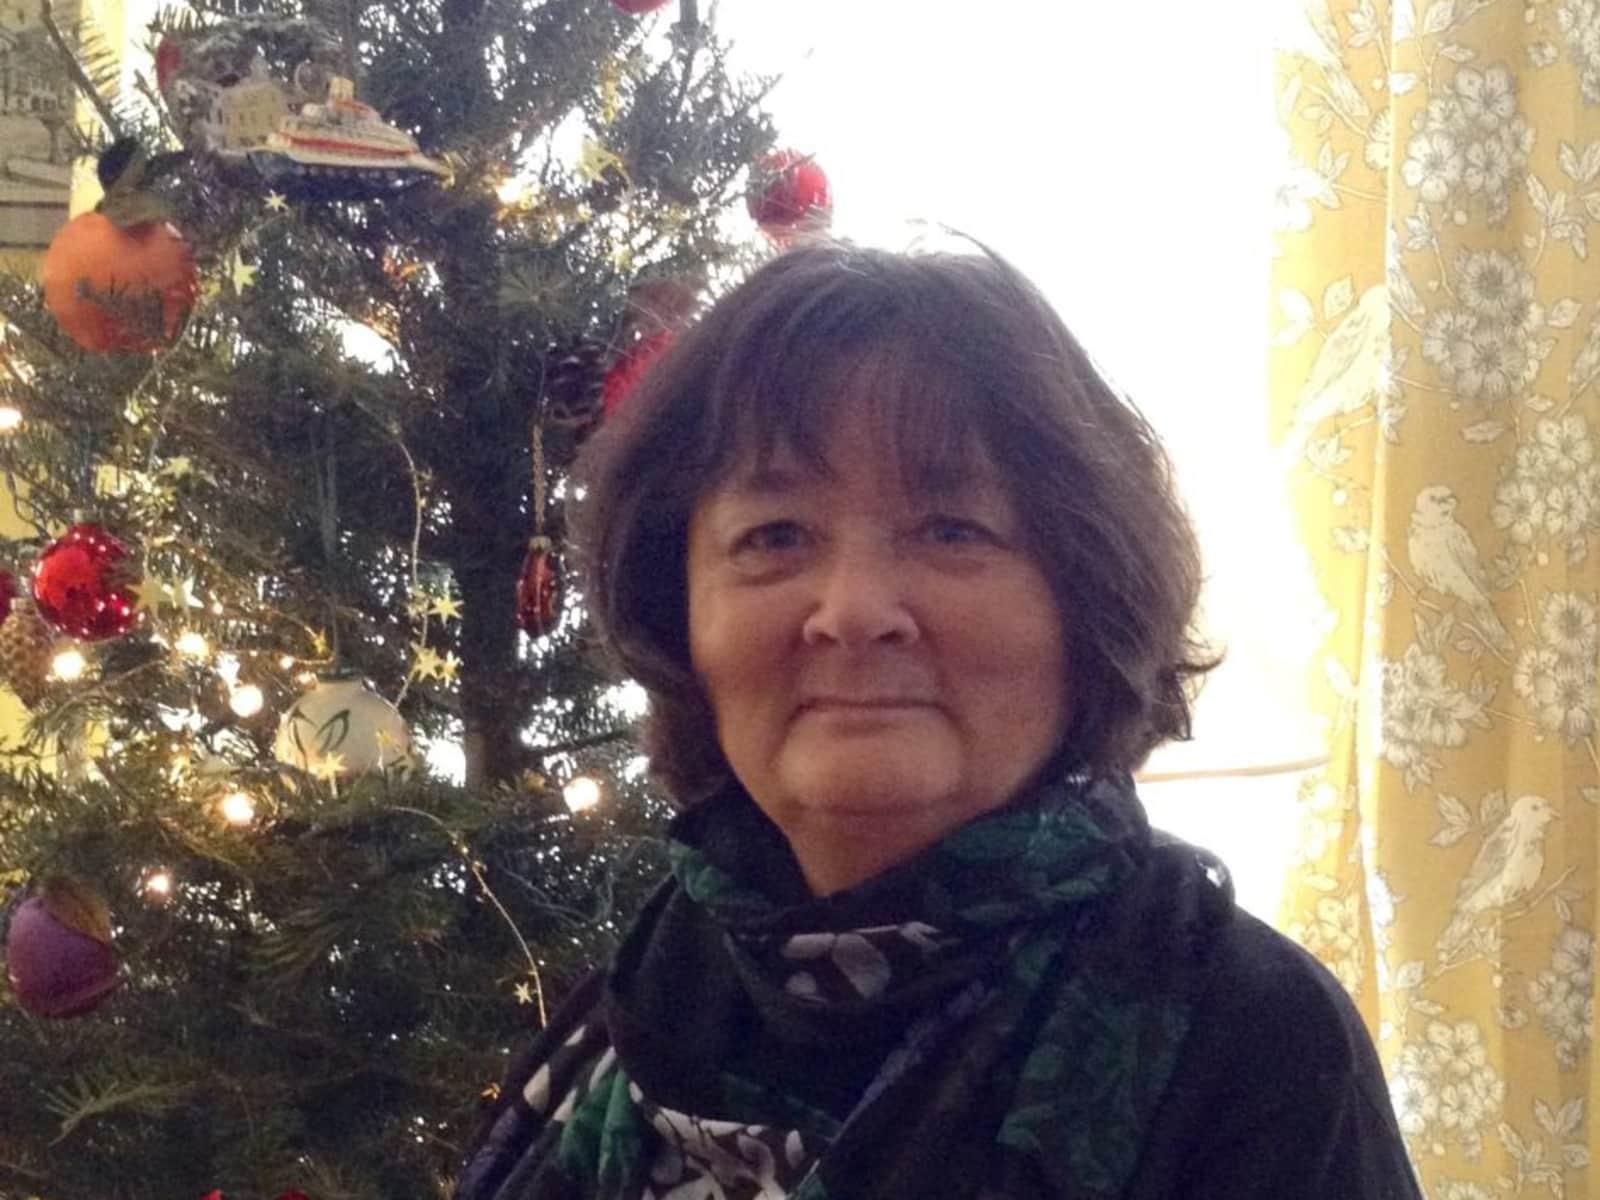 Margo from Boston, Massachusetts, United States